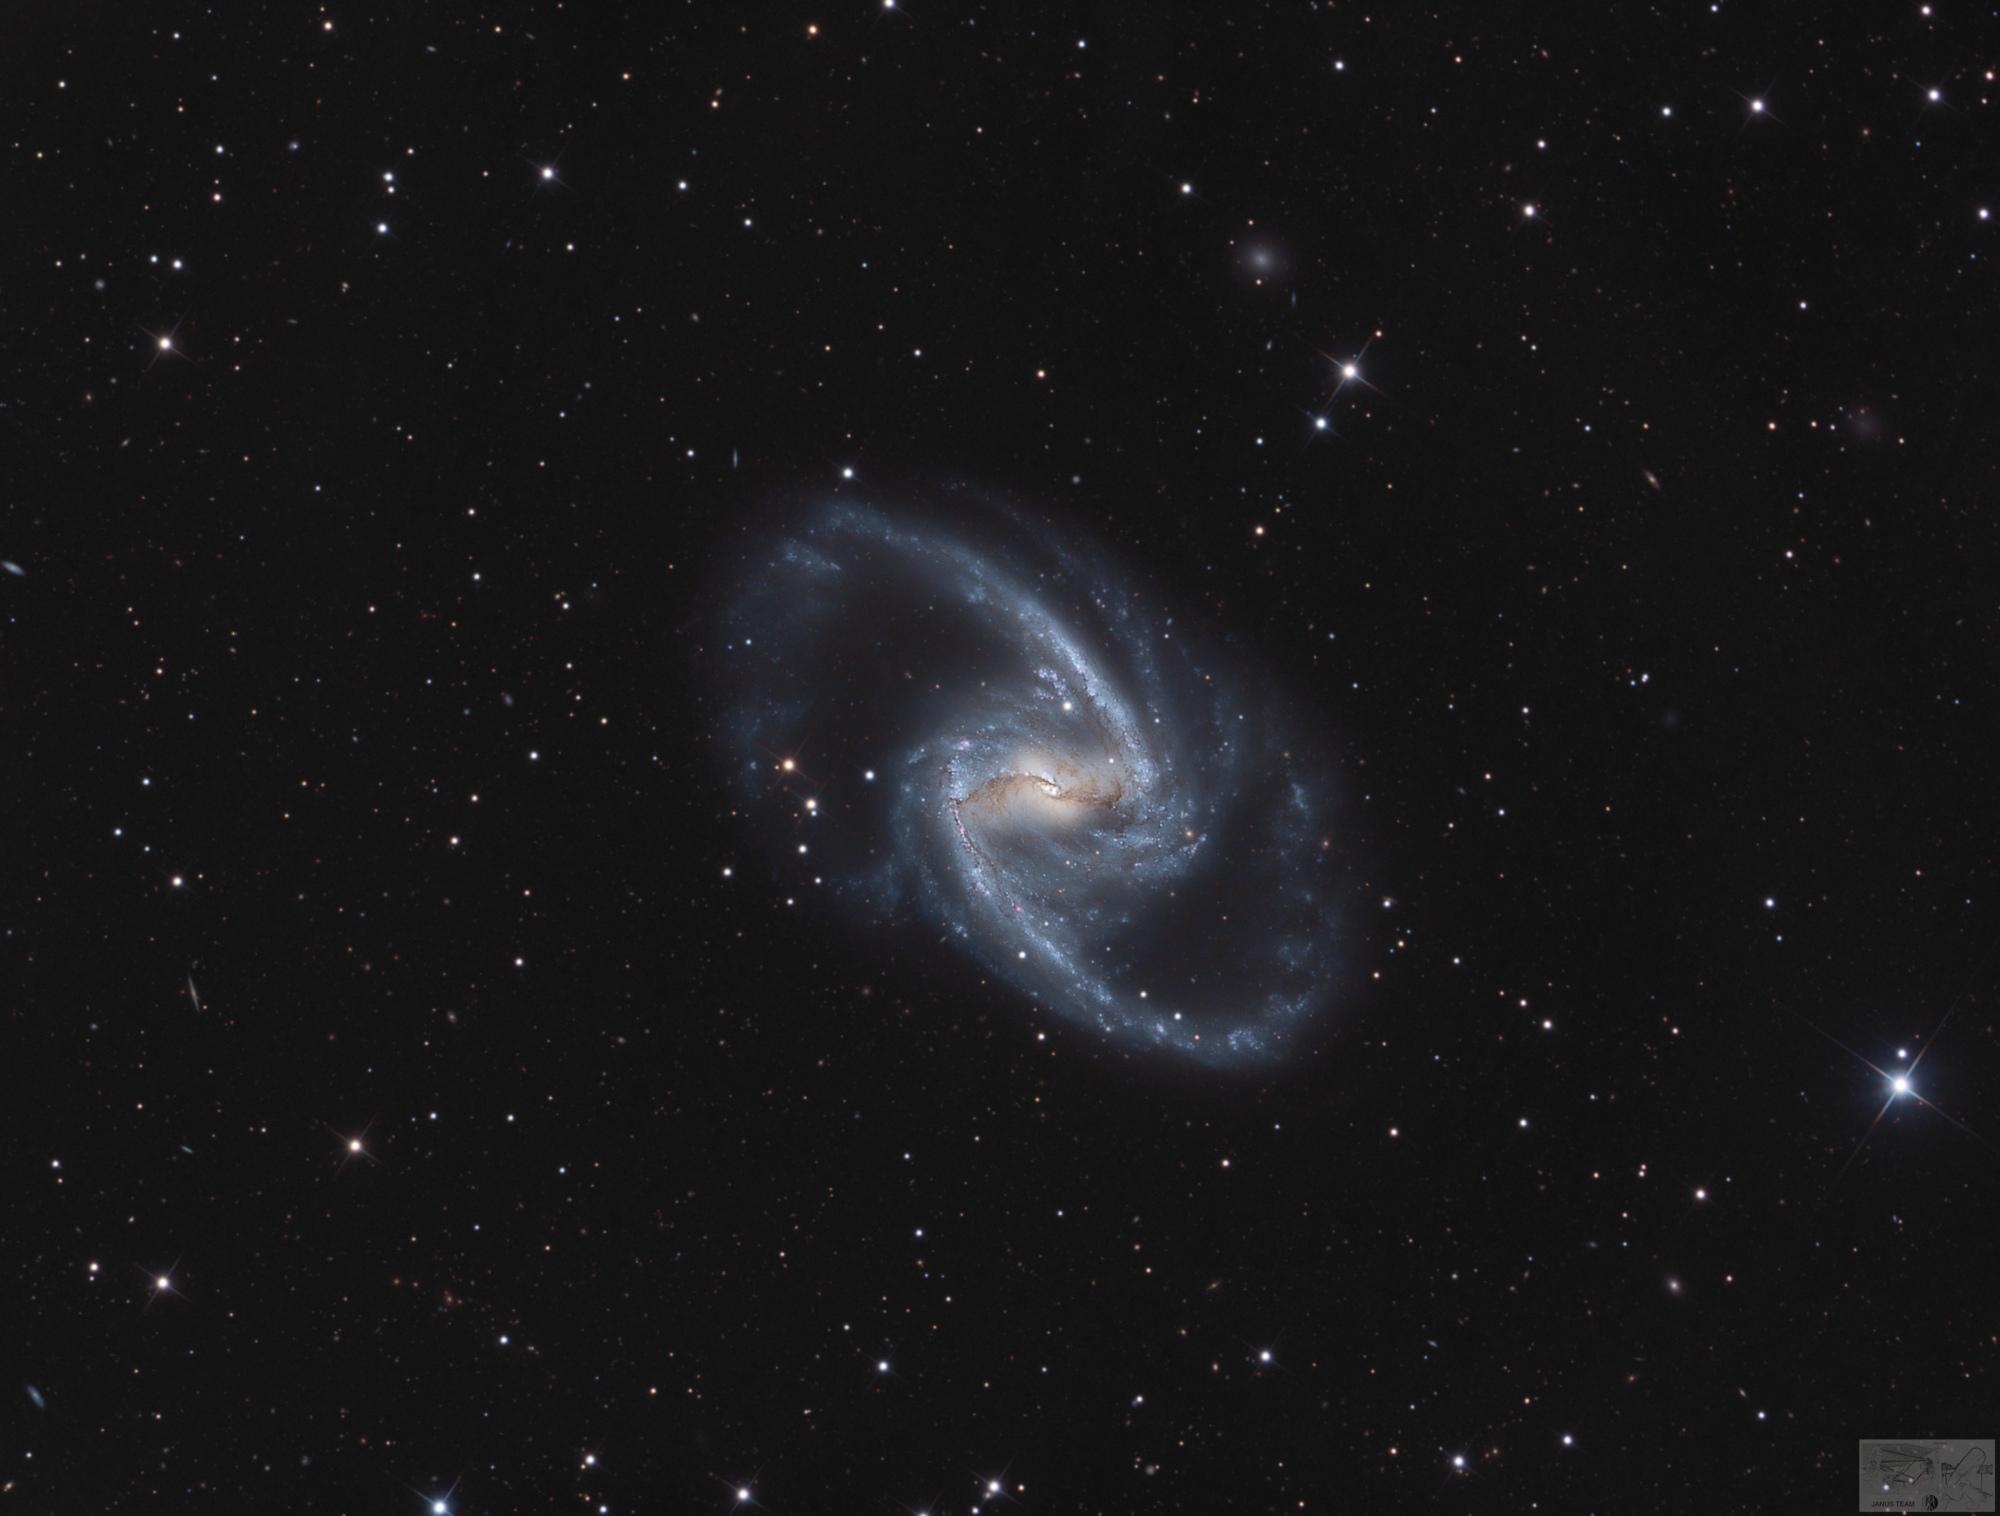 NGC1365_LRVB-V3-Log.jpg